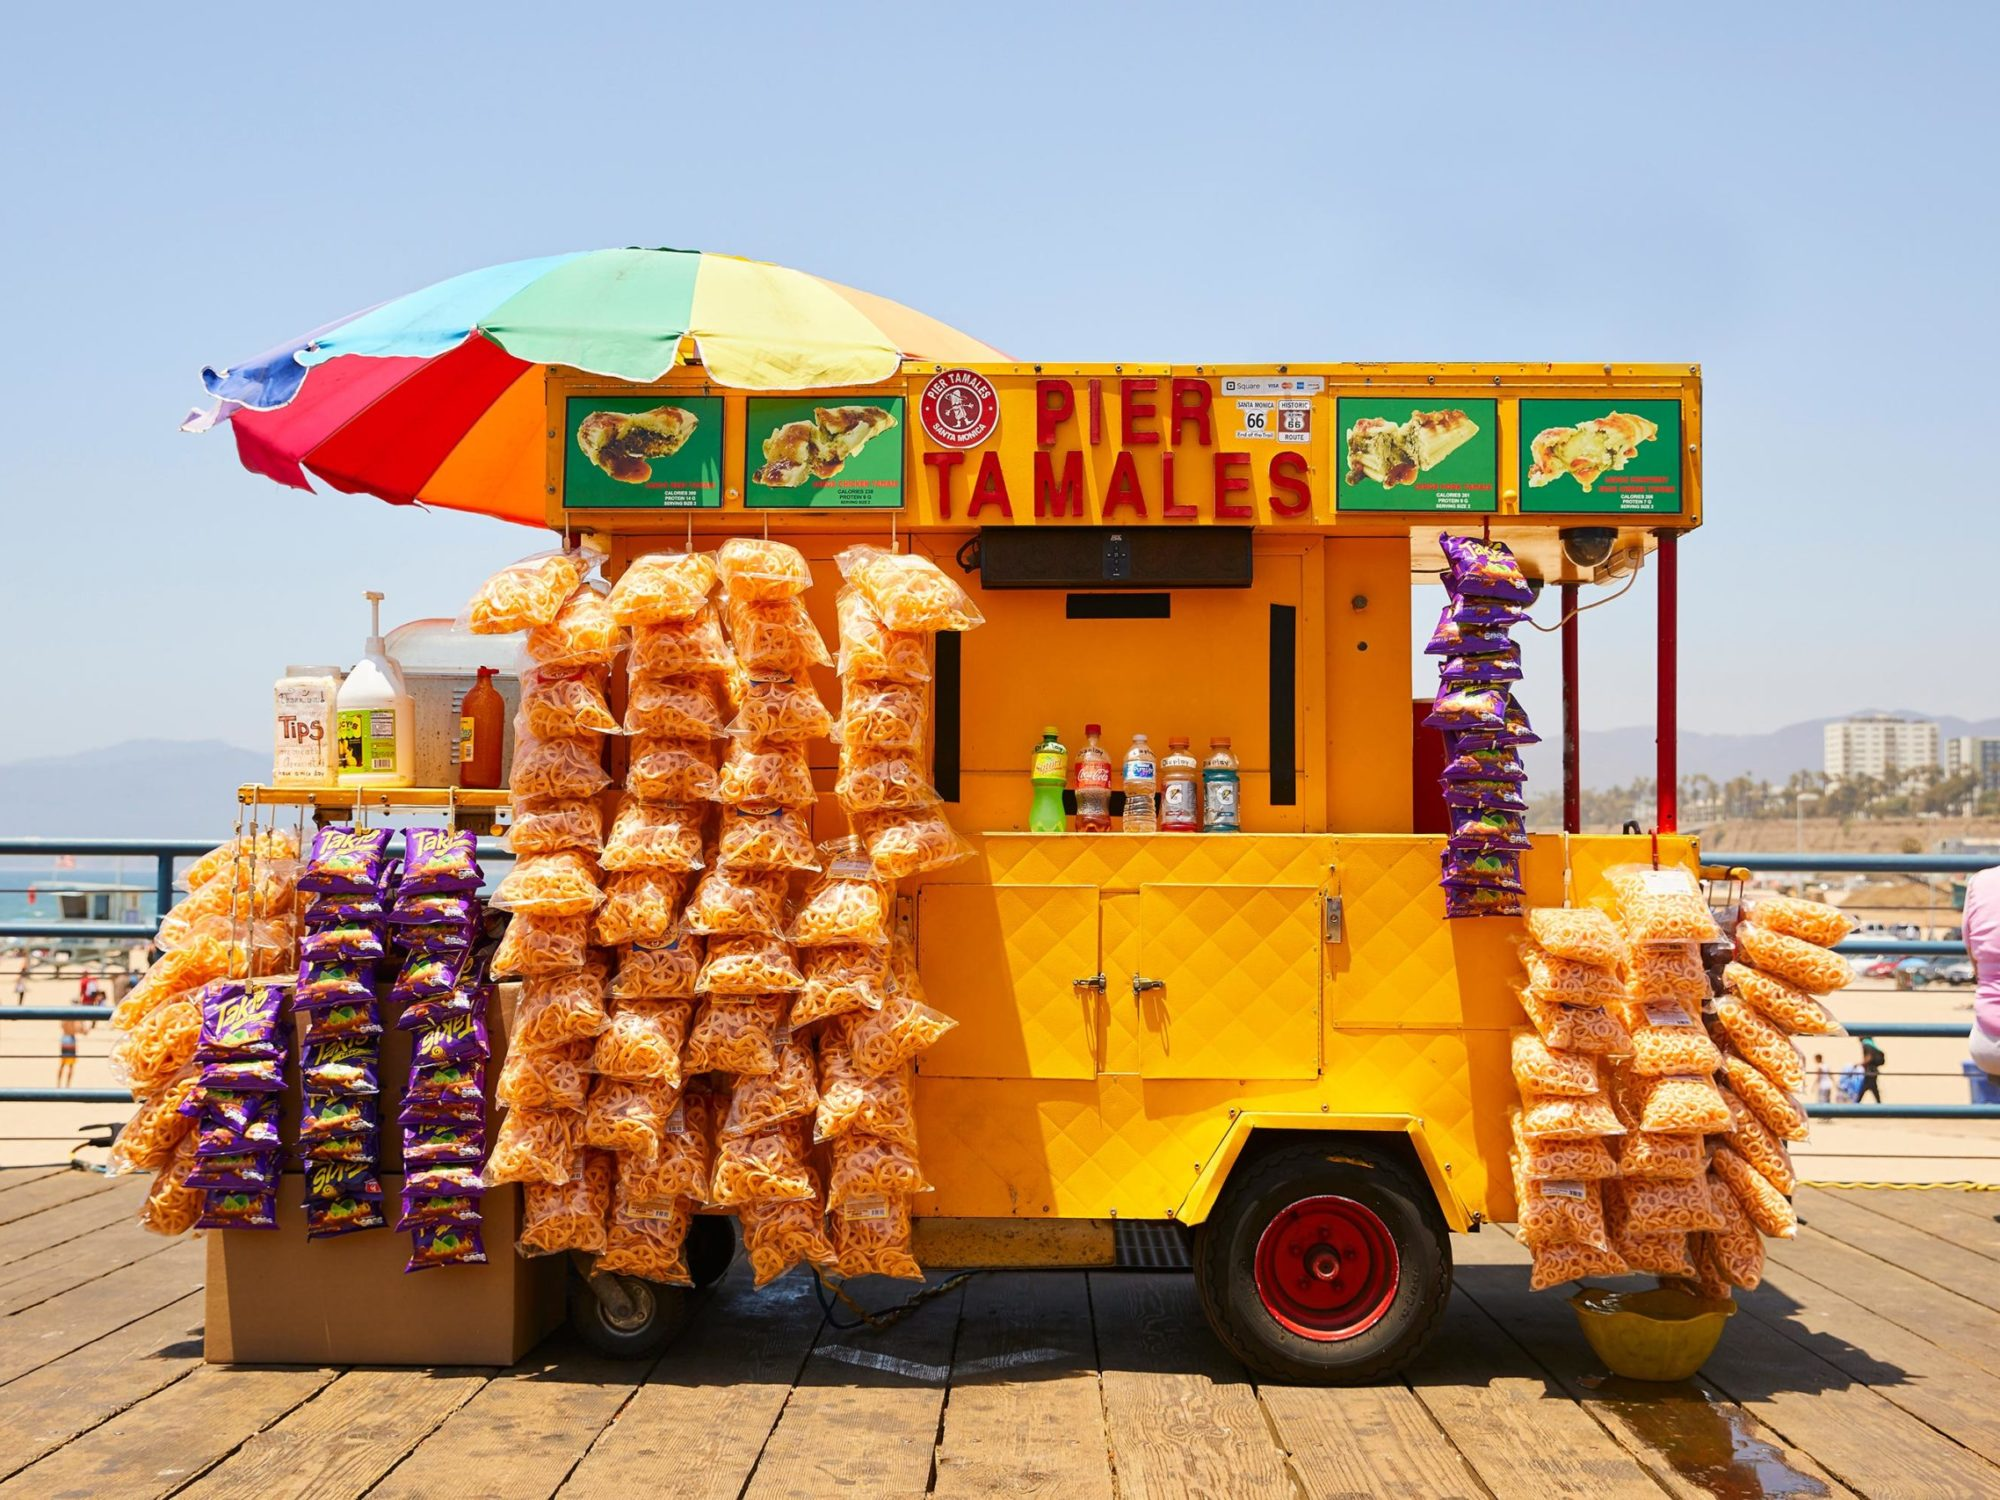 Santa Monica Pier 3 - Carnival Collection - Fine Art Photography by Toby Dixon